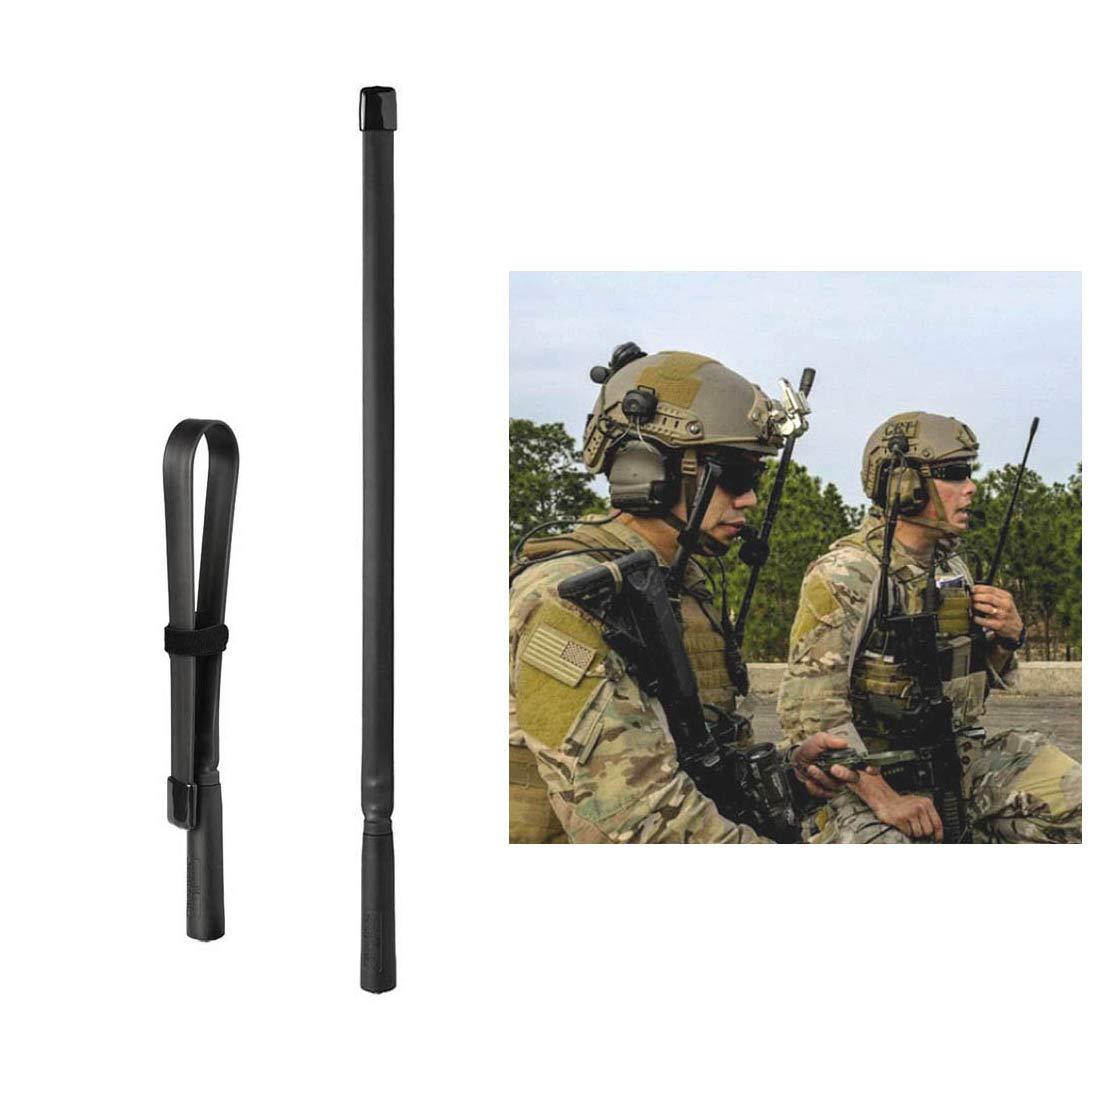 Folding CS Tactical Antenna Dual Band Foldable SMA-F for Baofeng Uv-5R Uv-5Ra Uv-5Rc Uv-5Re Uv-82 BF-F8HP UV-82HP UV-5X3 UV-9r